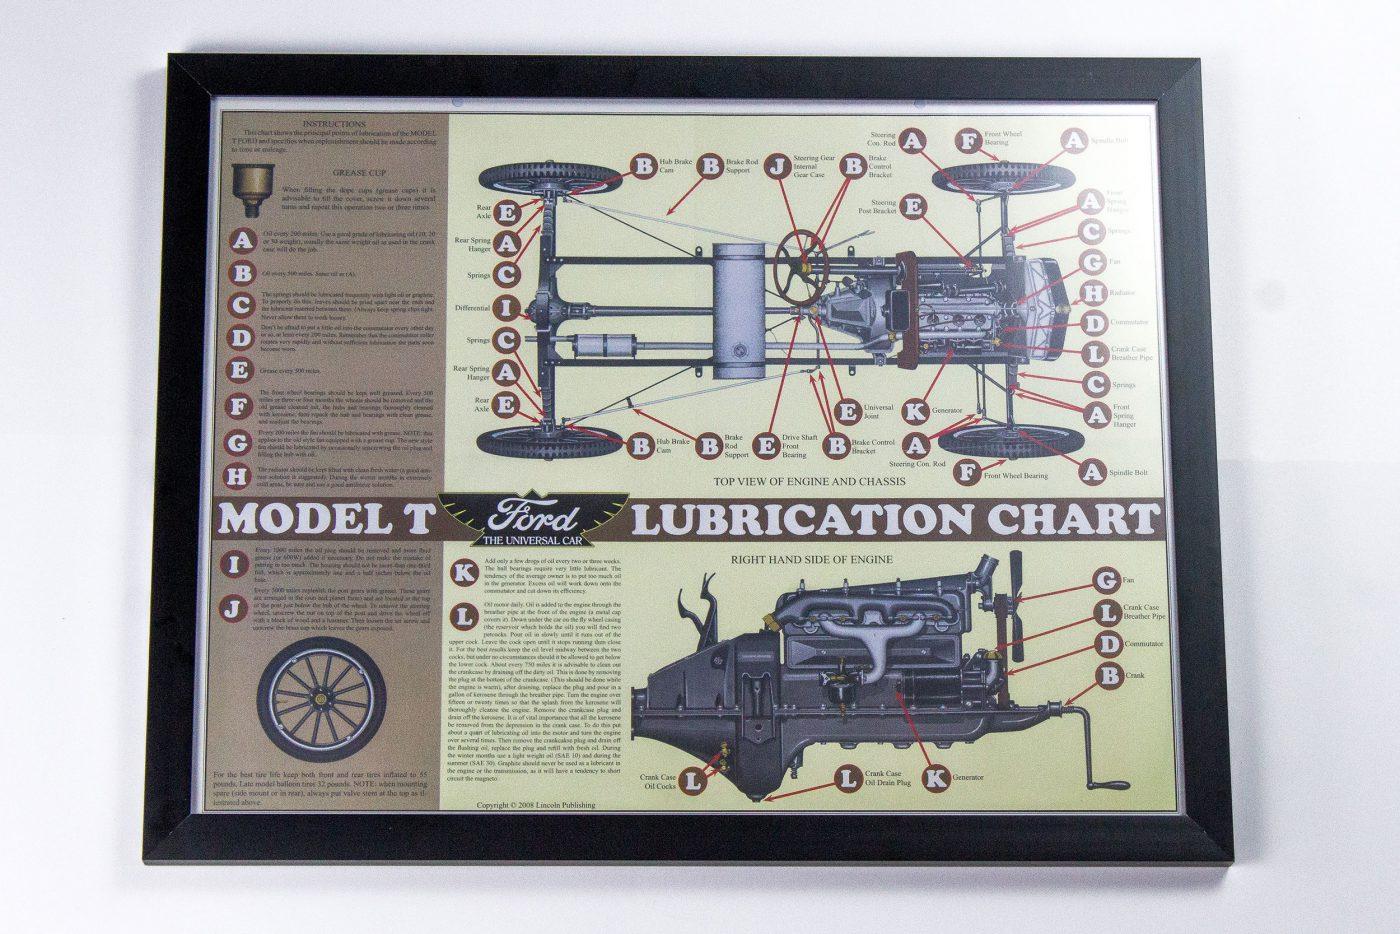 Model T Lubrication Chart Ford Piquette Avenue Plant